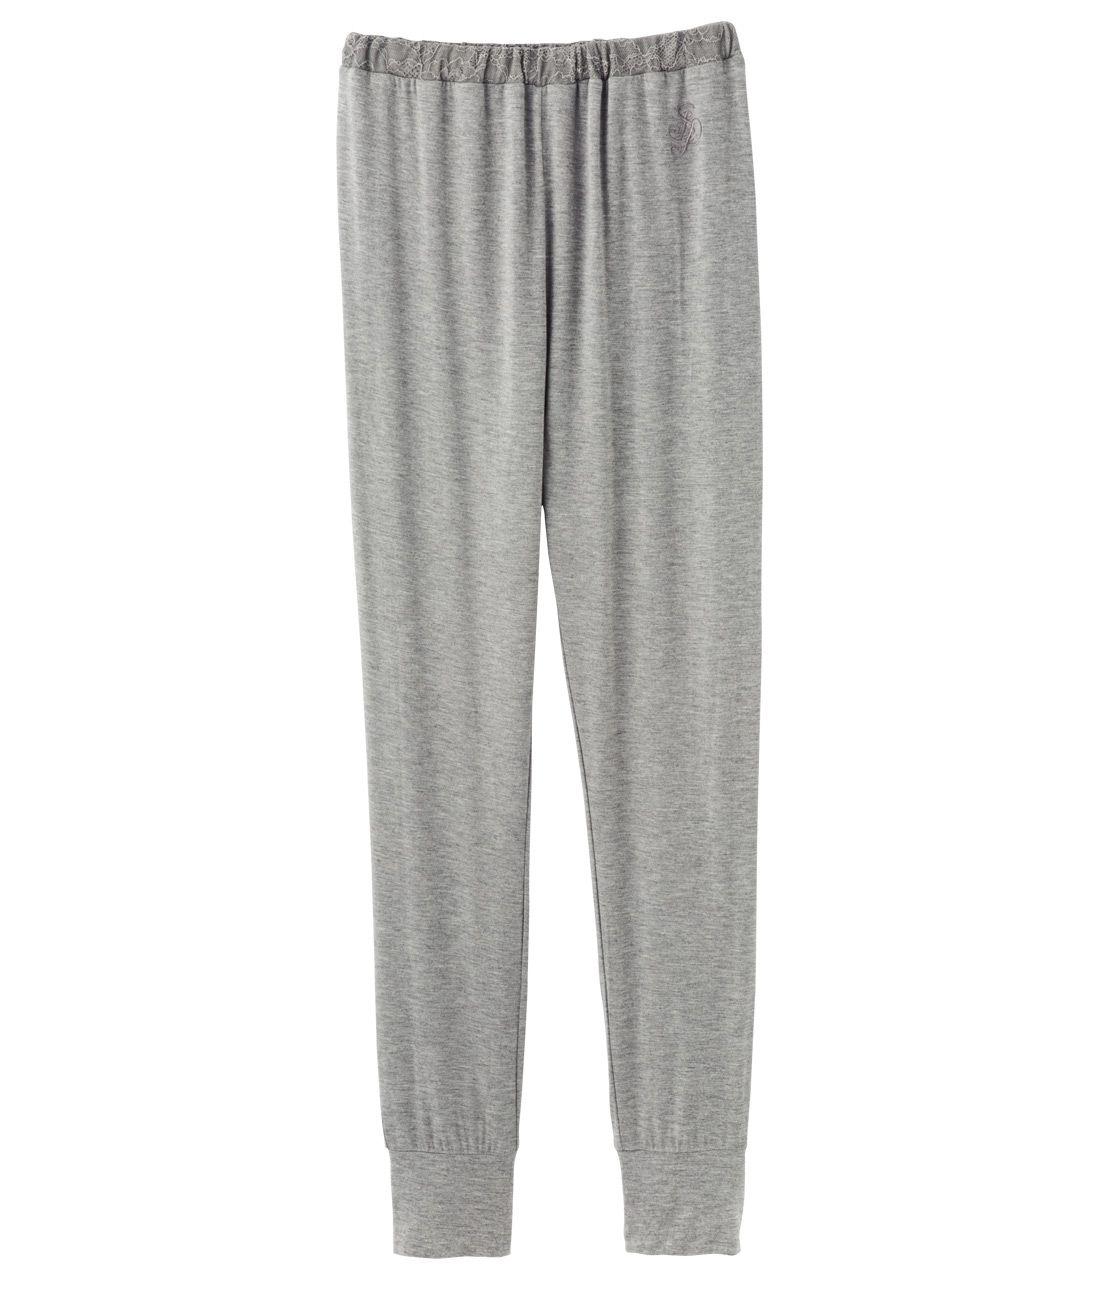 Soft rayon leggings